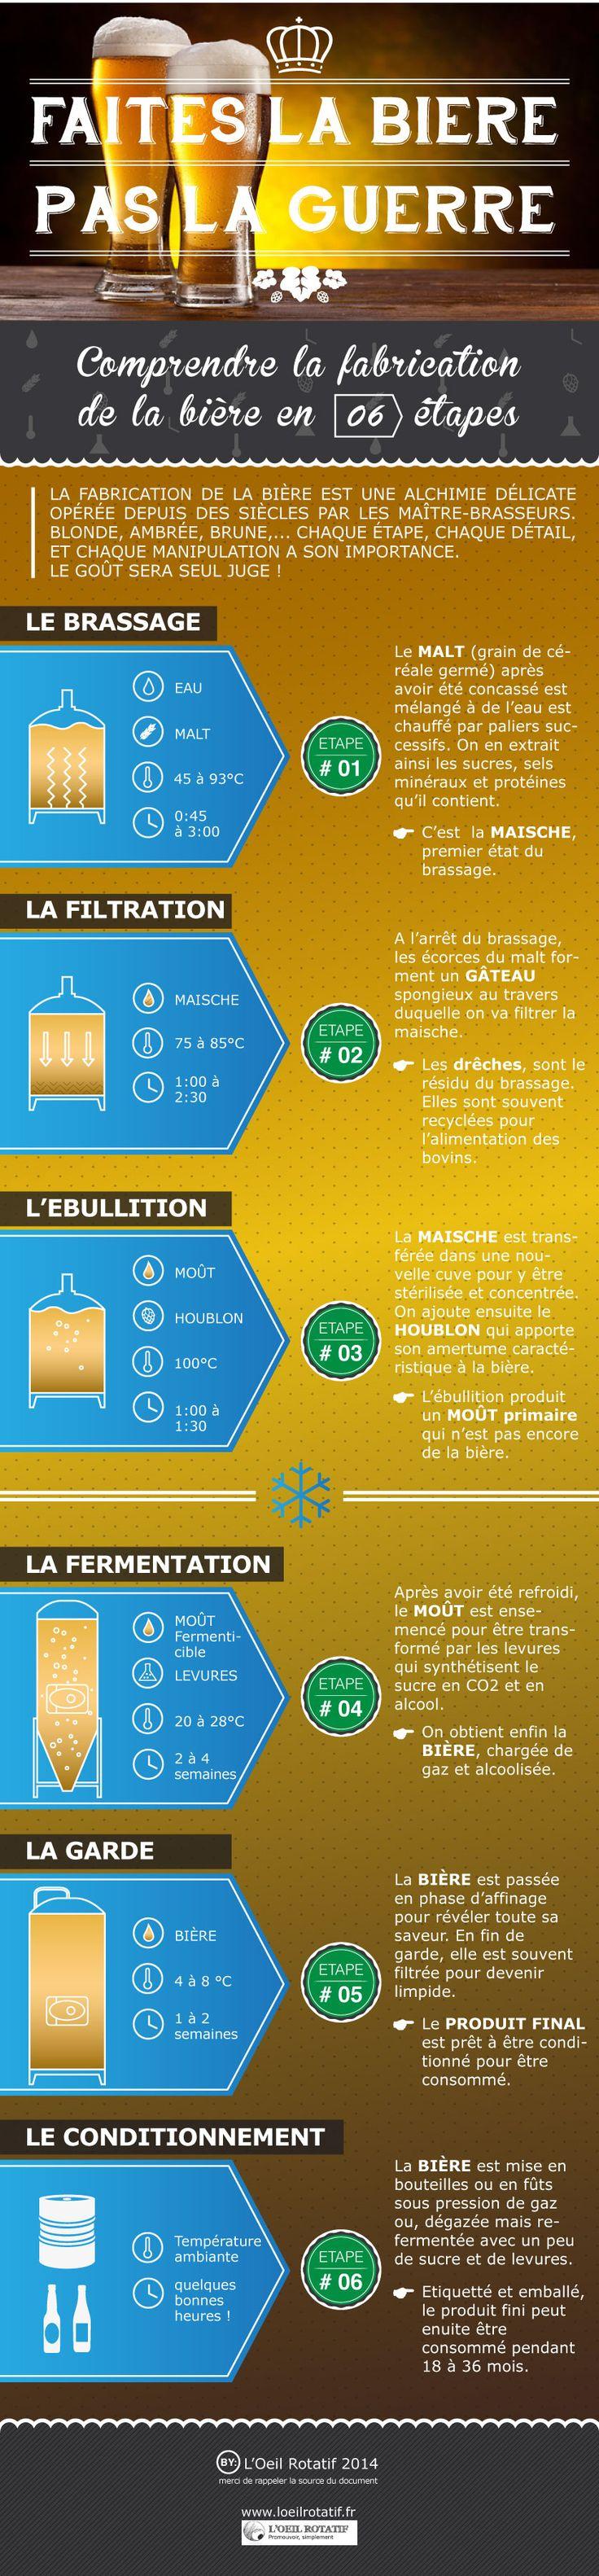 La fabrication de la bière | L'Oeil Rotatif